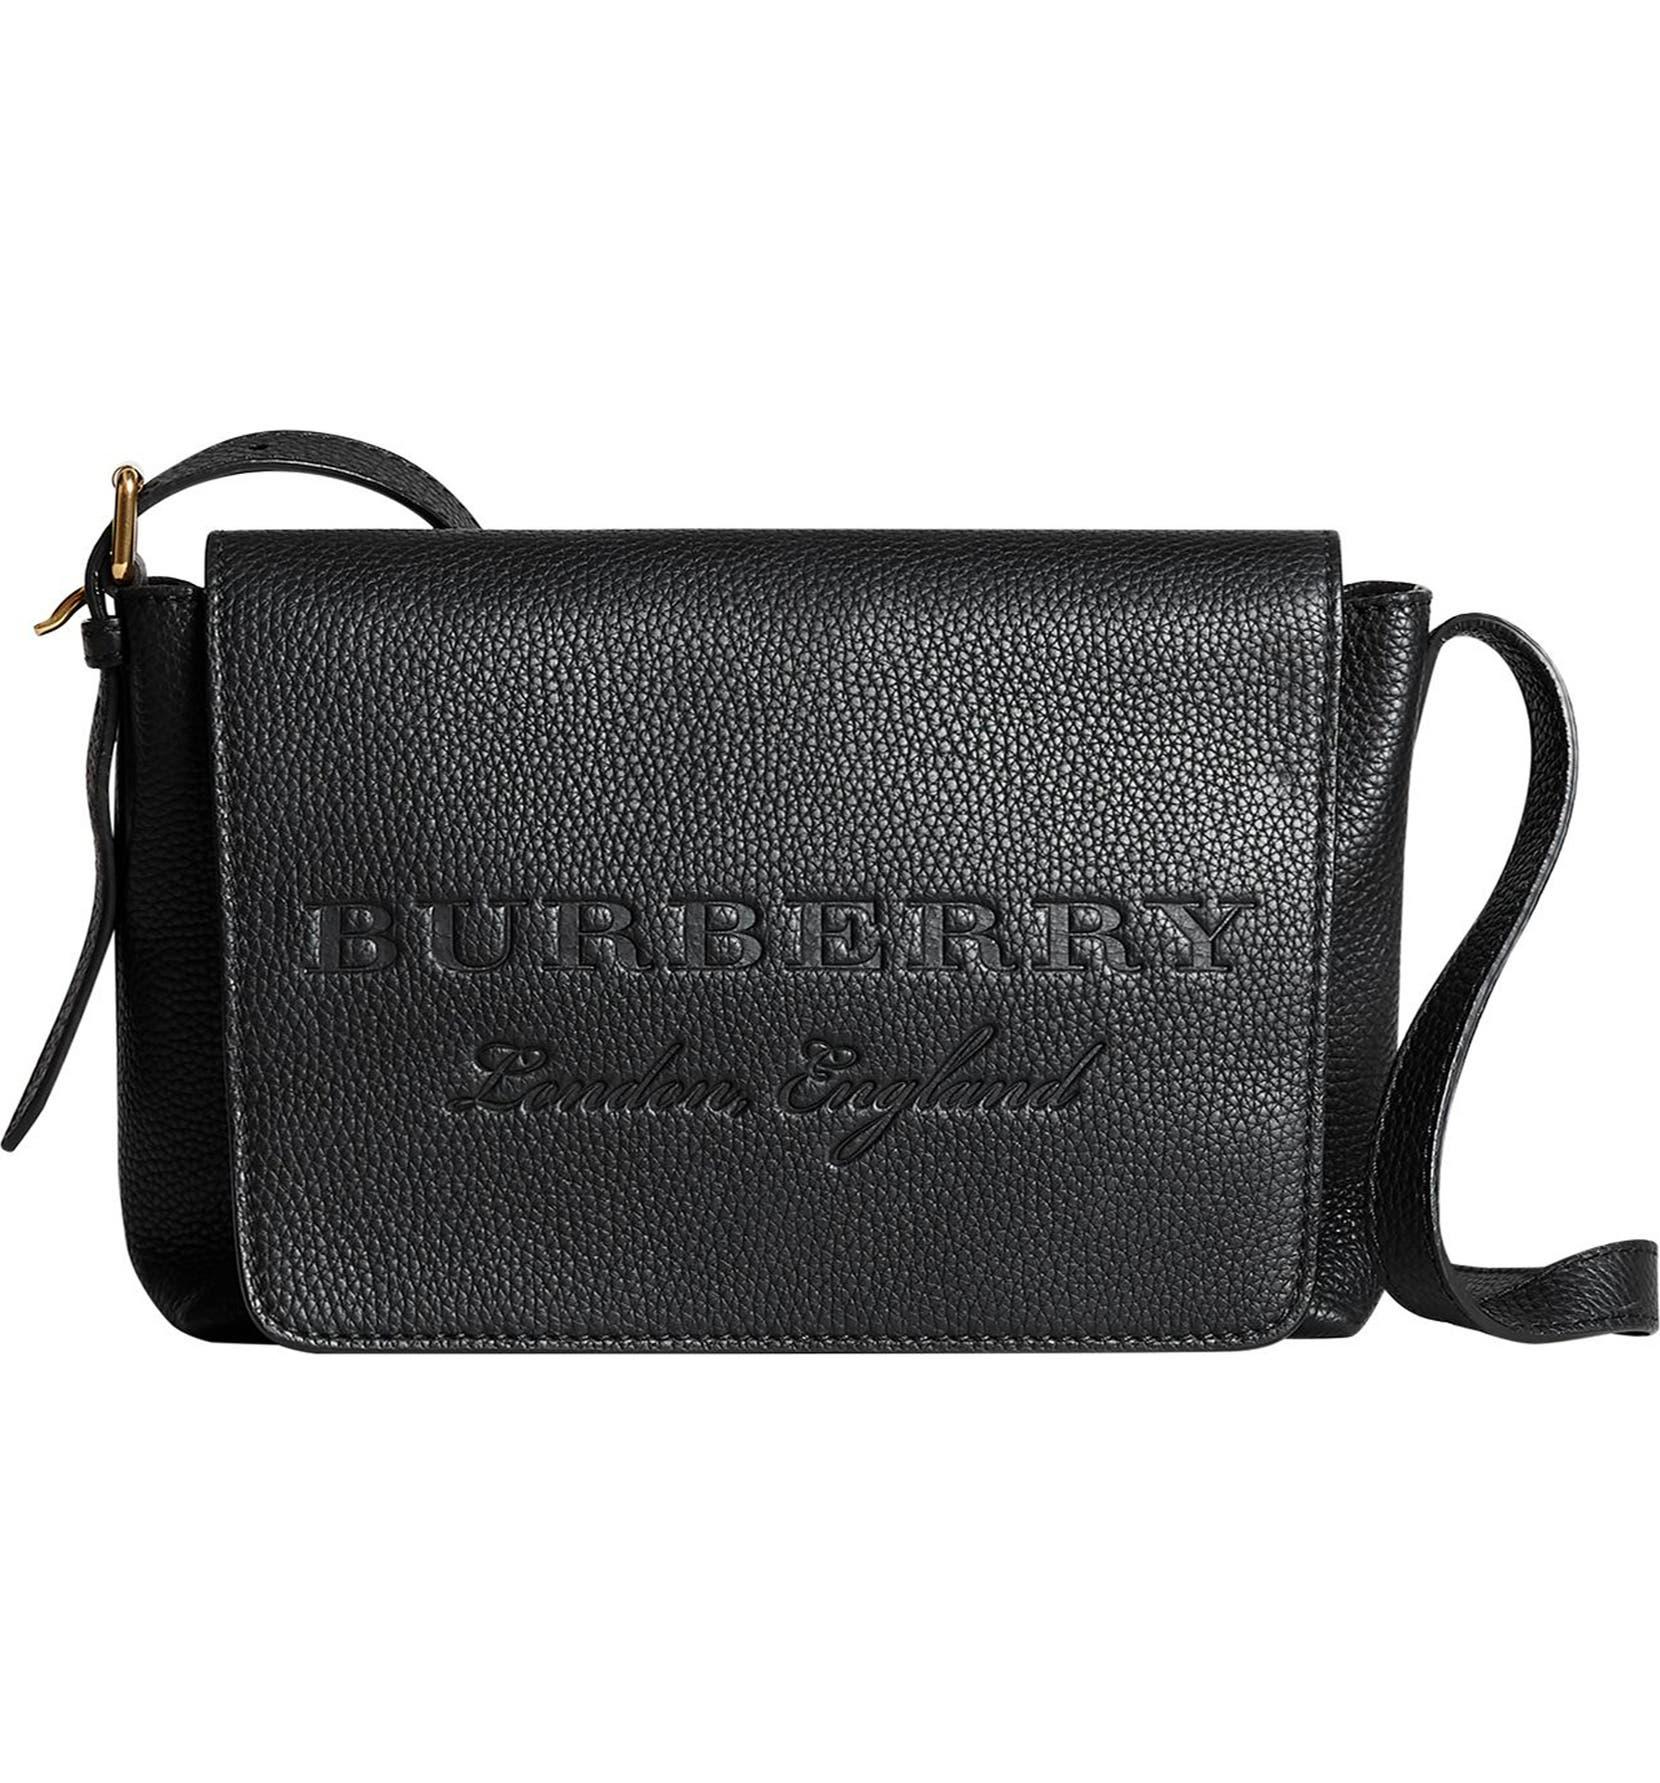 8fe5fabcb00 Burberry Small Burleigh Leather Crossbody Bag